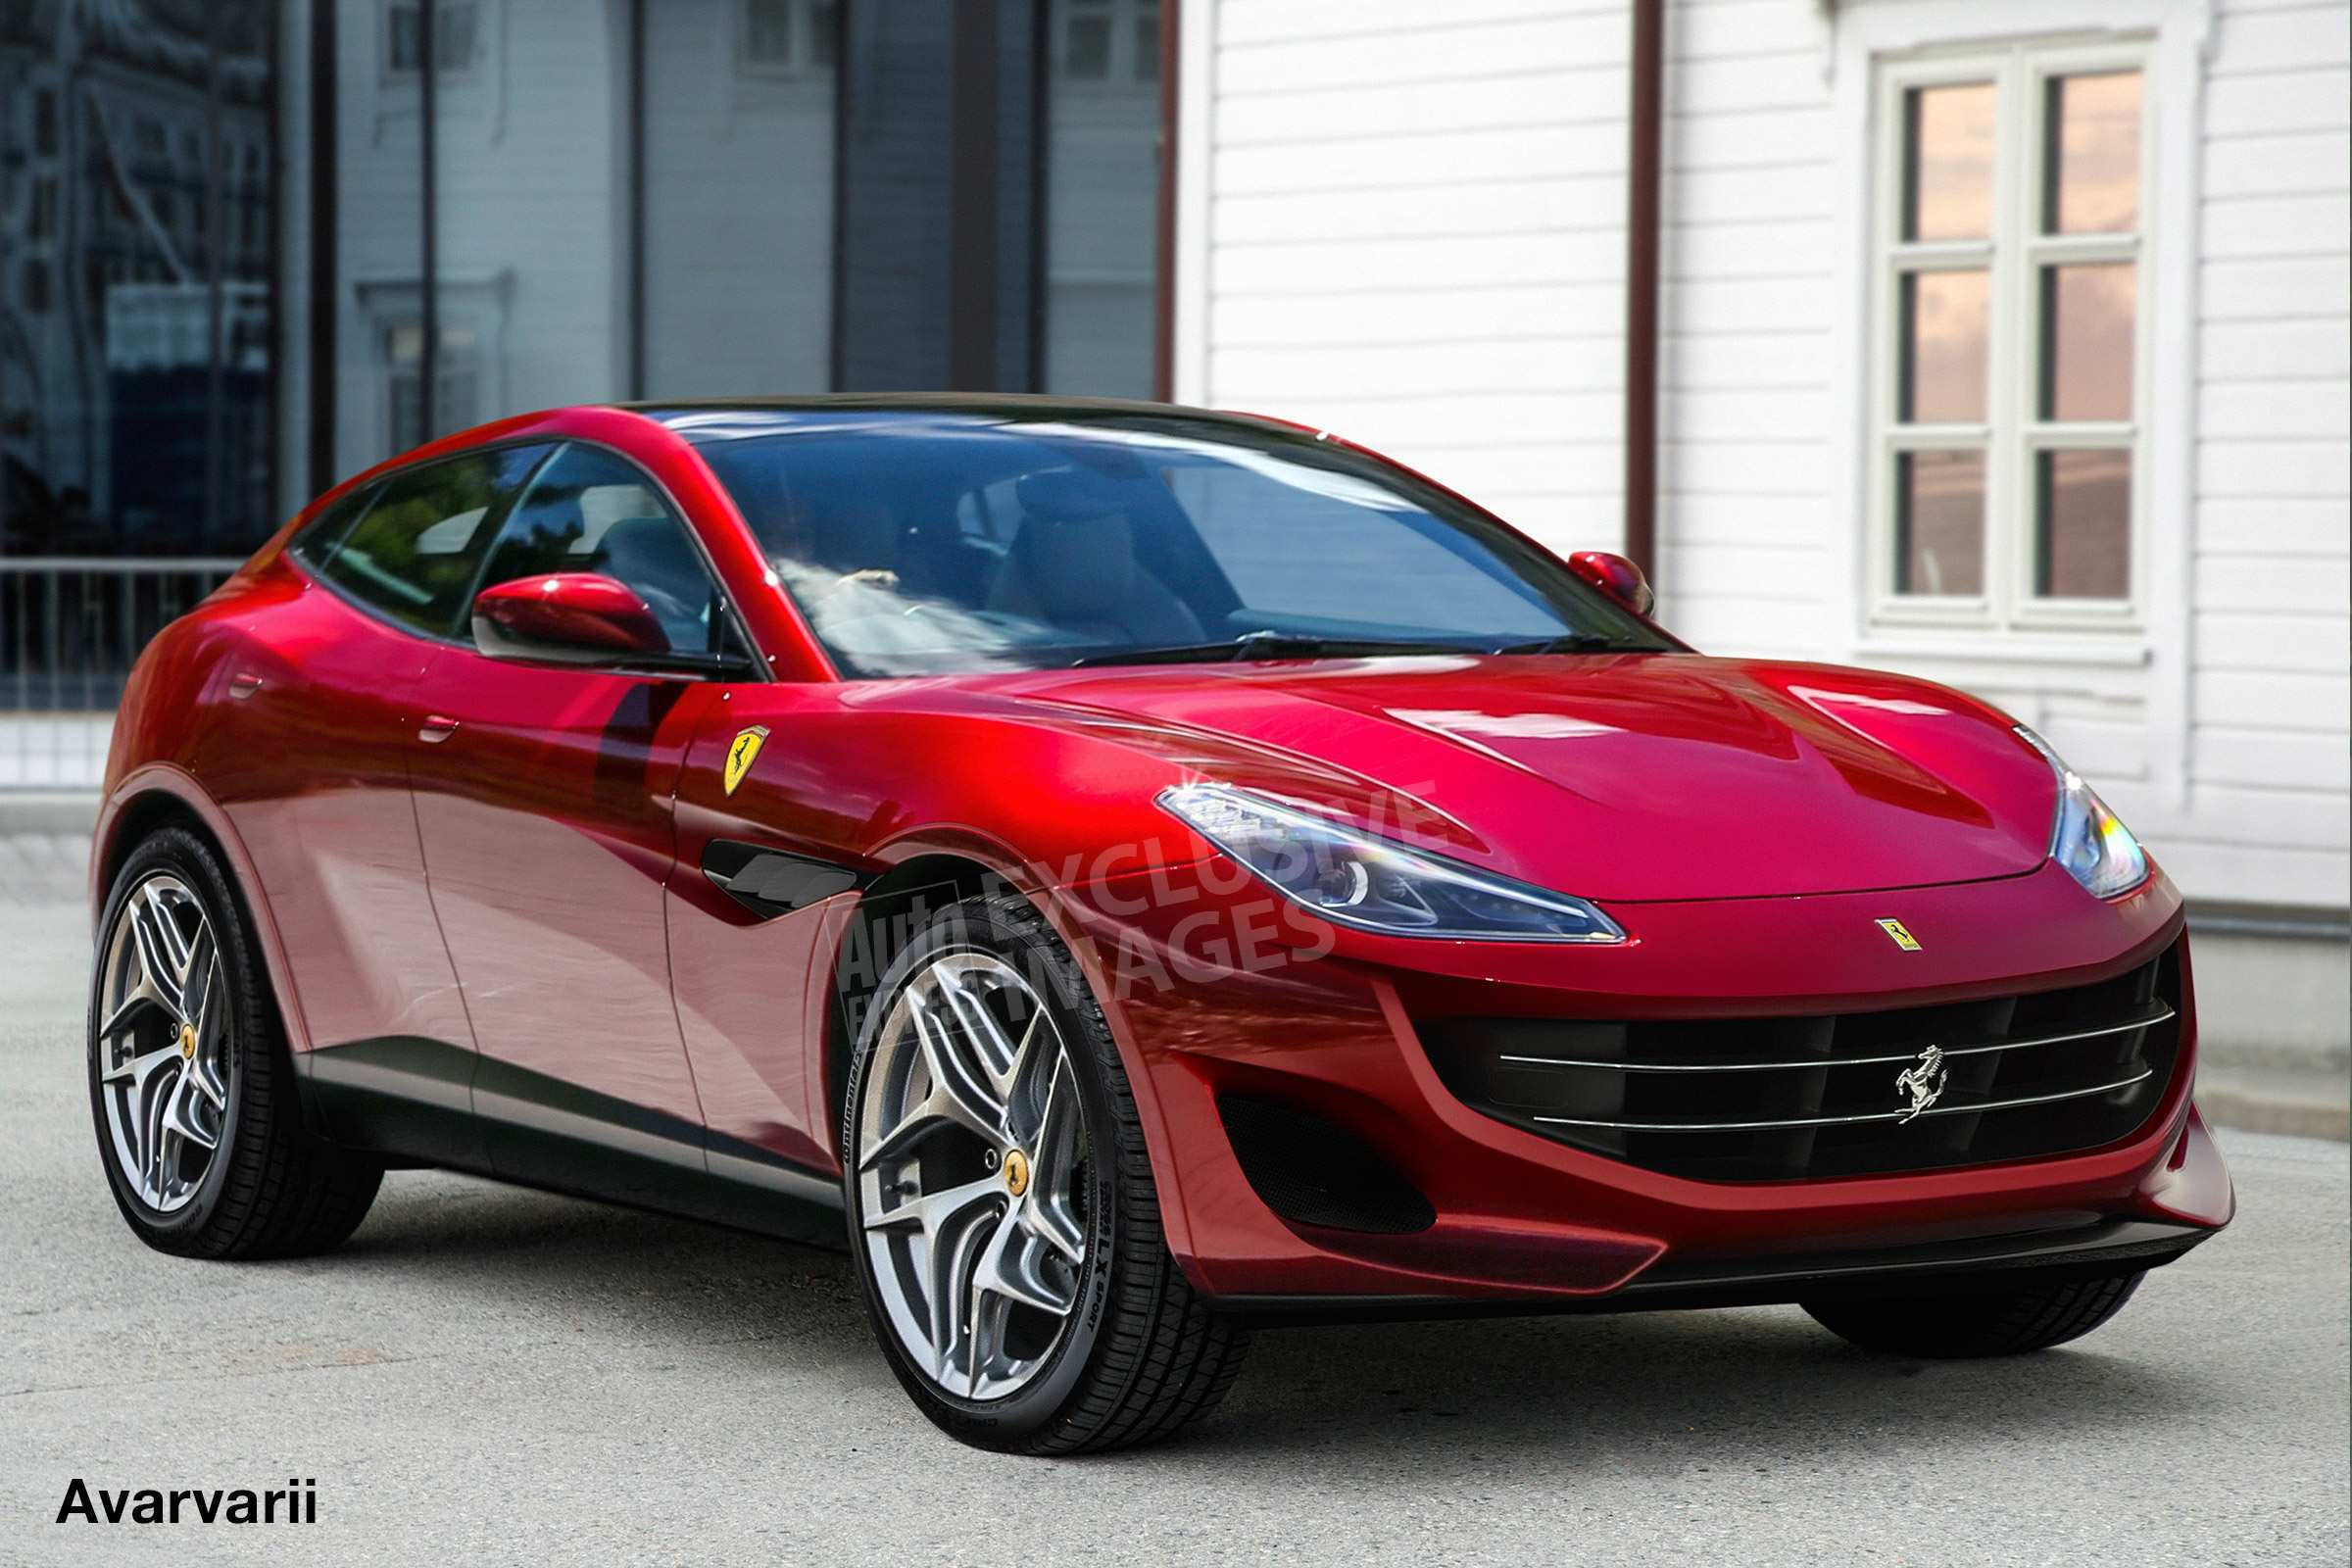 86 Gallery of 2020 Ferrari Dino Exterior and Interior for 2020 Ferrari Dino